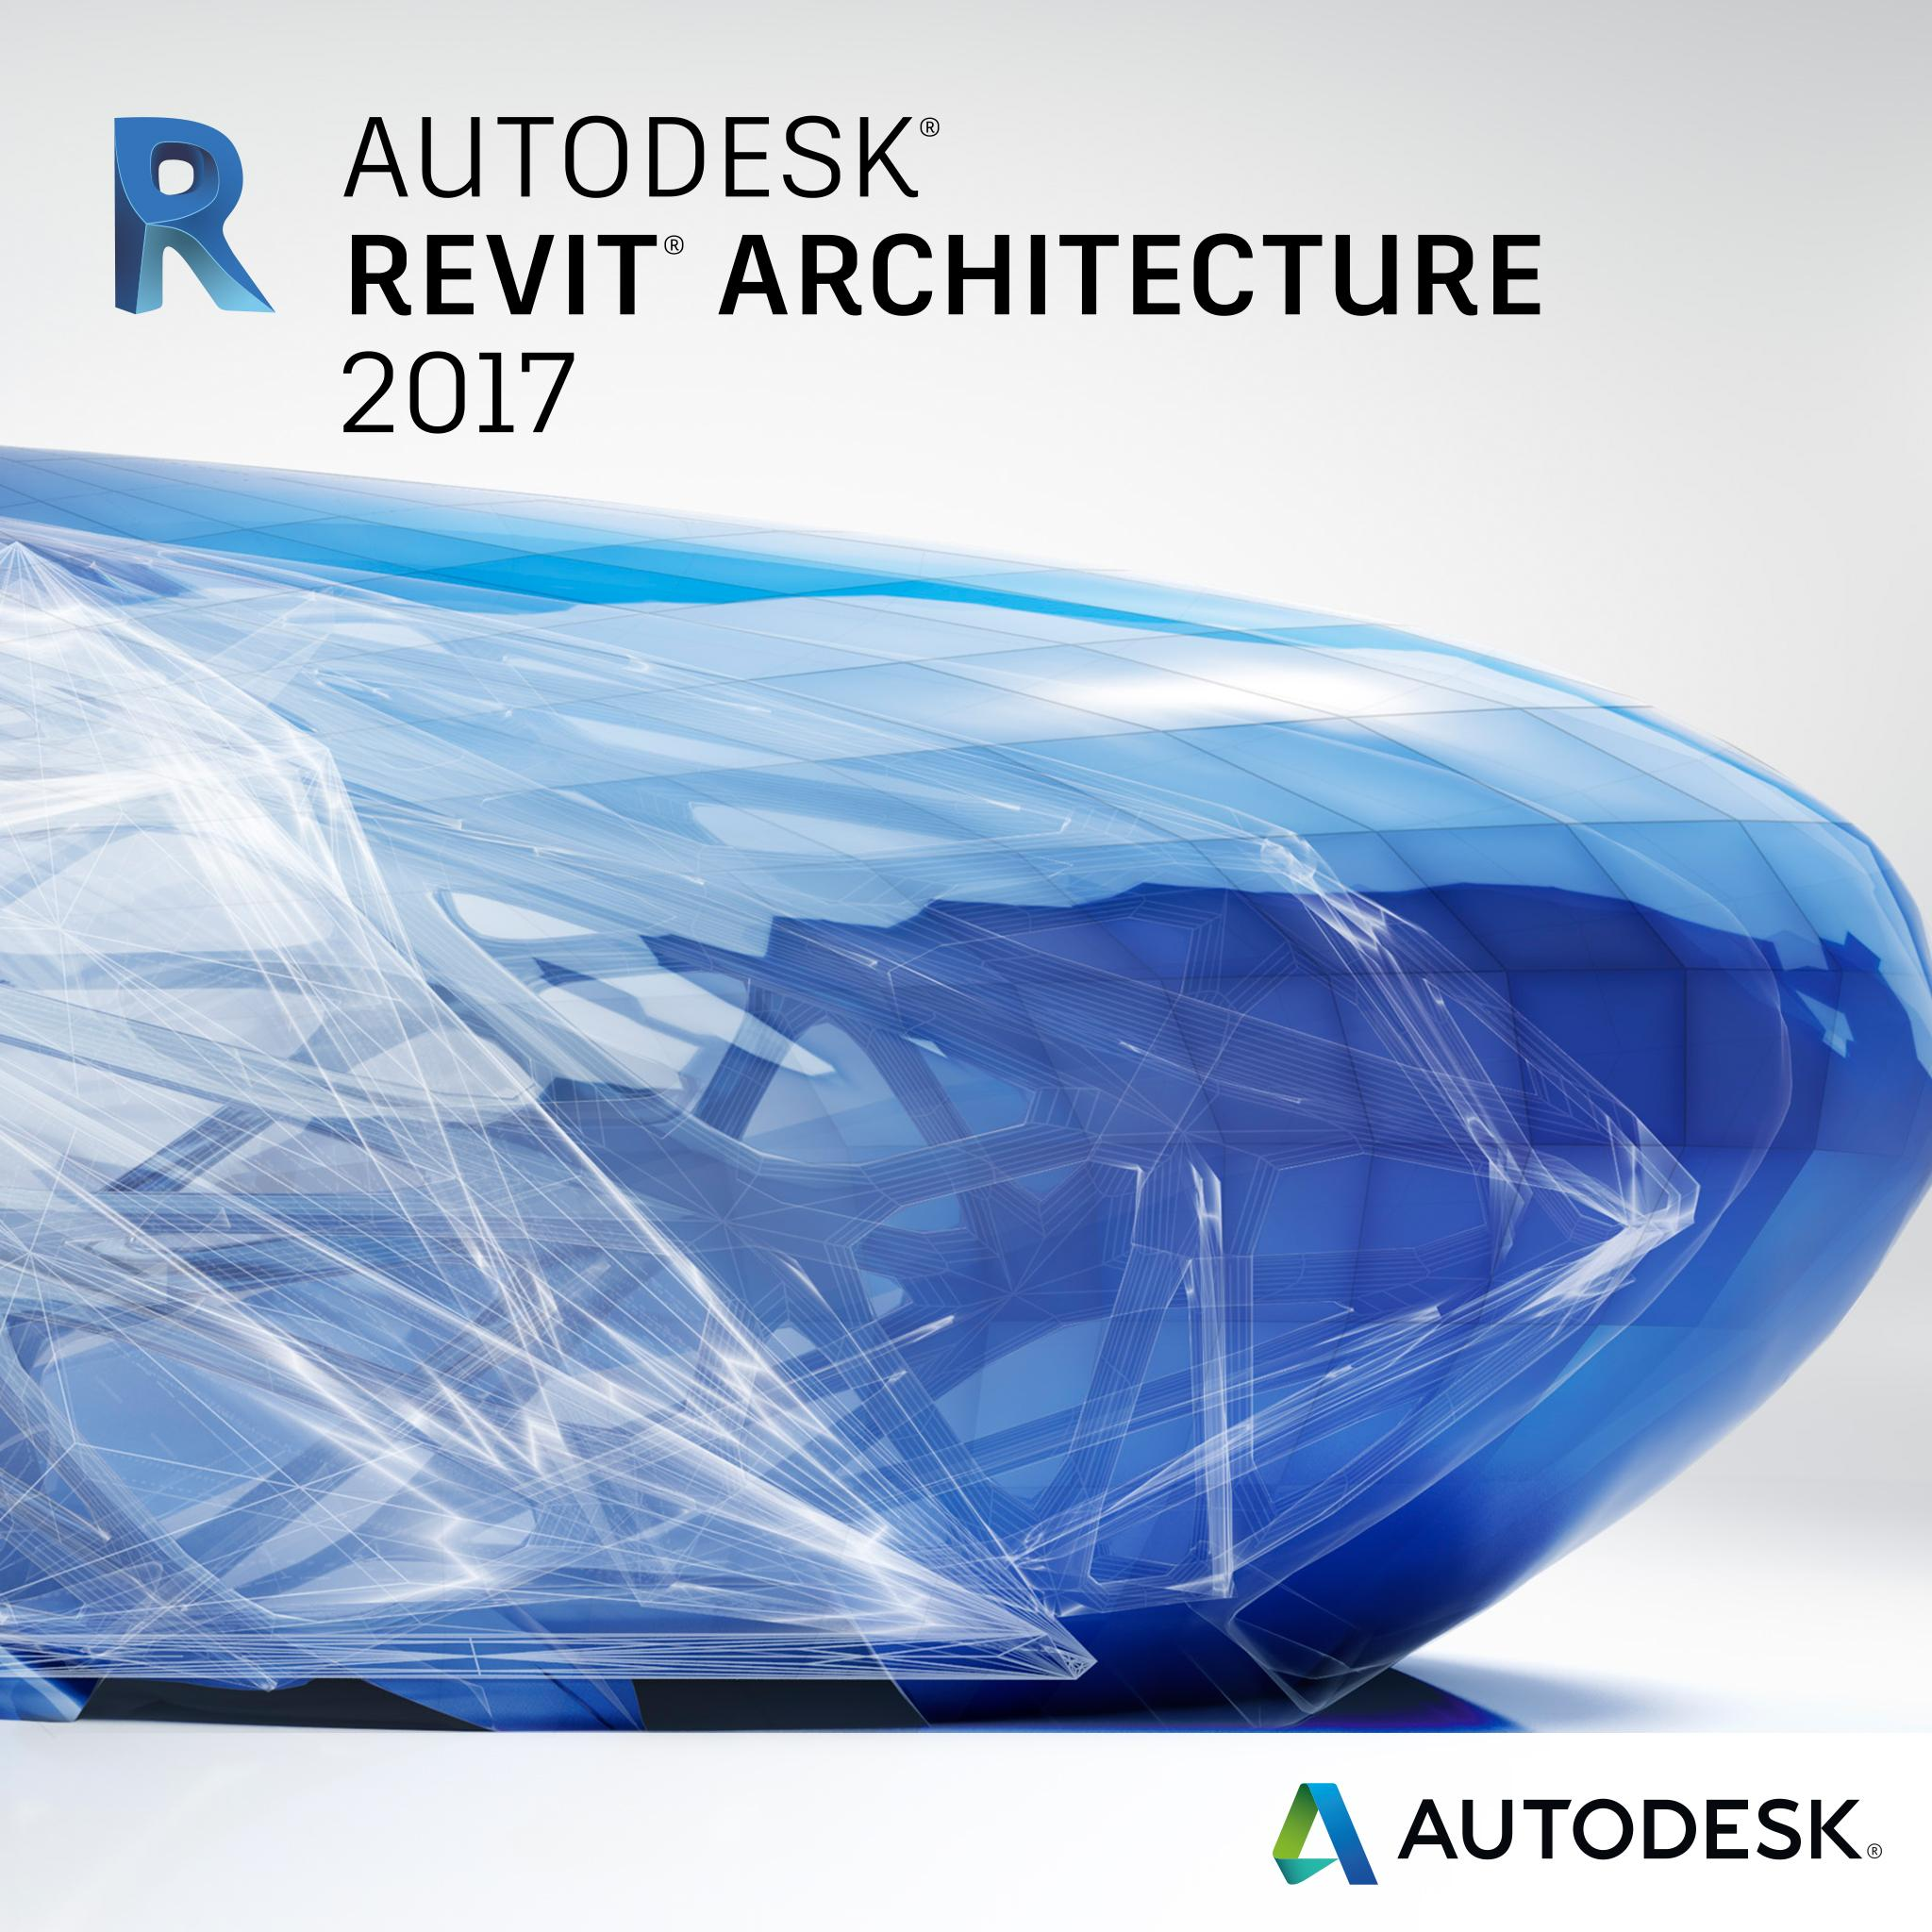 2016 Autodesk Revit Architecture 2017 For 64bit English Full Version 1